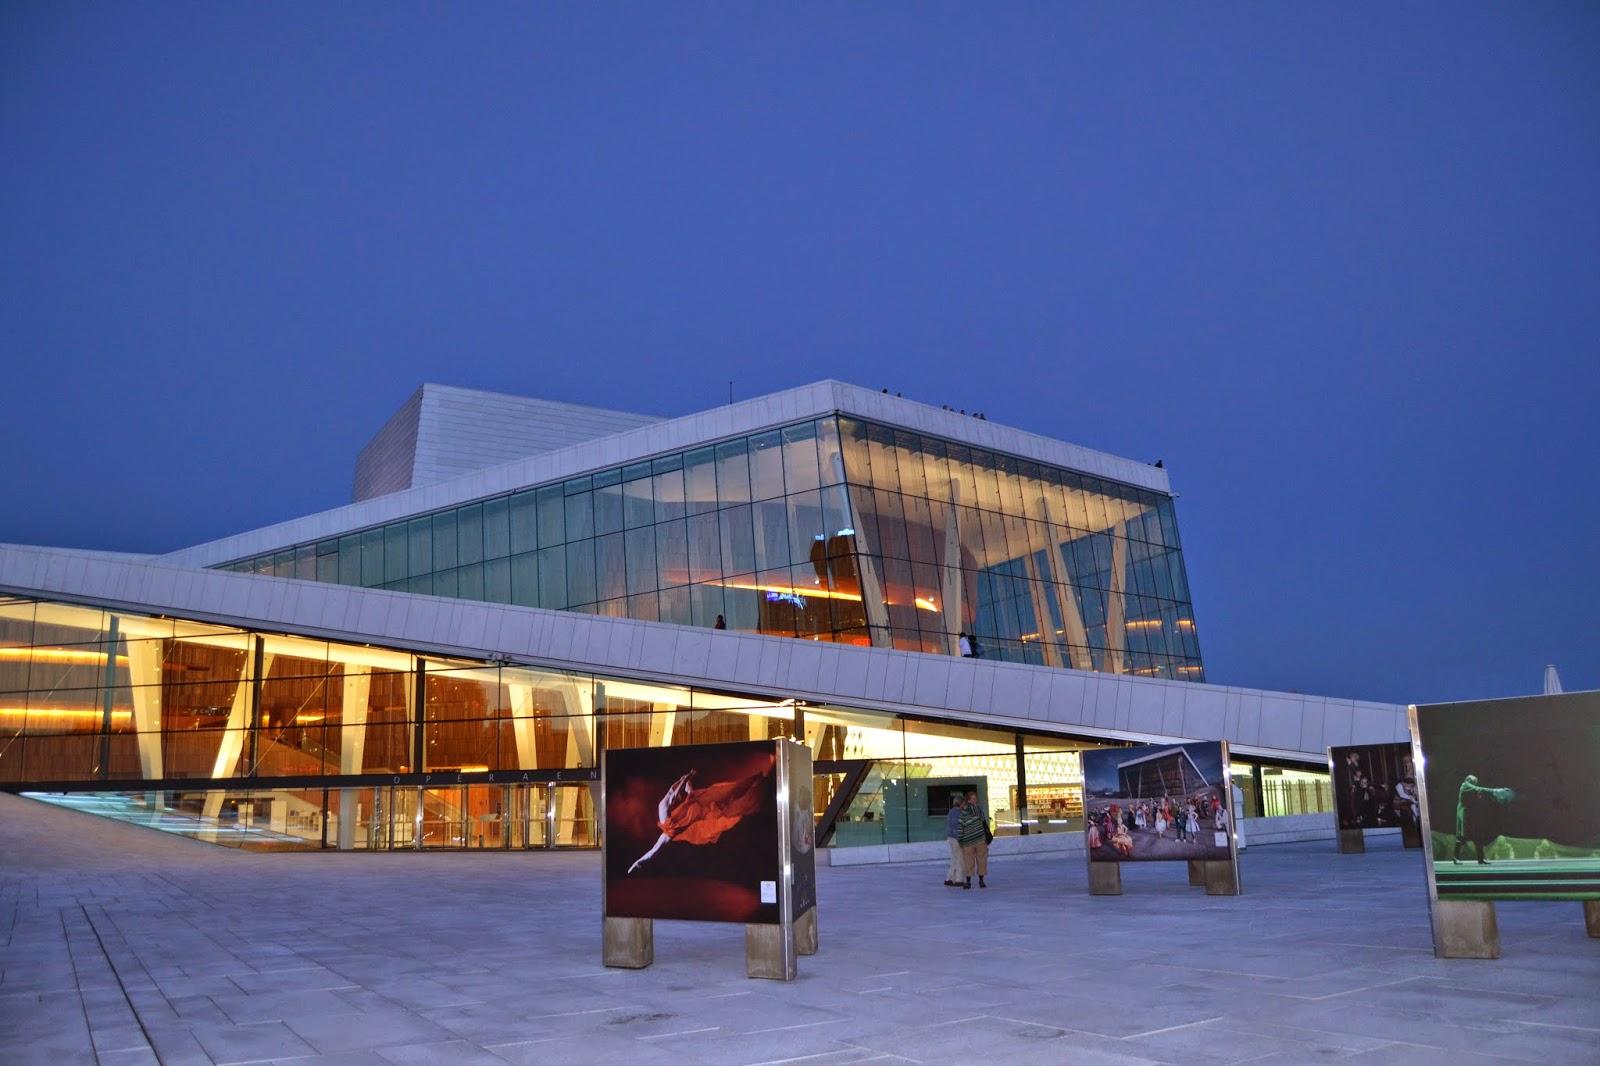 Oslo opera house night